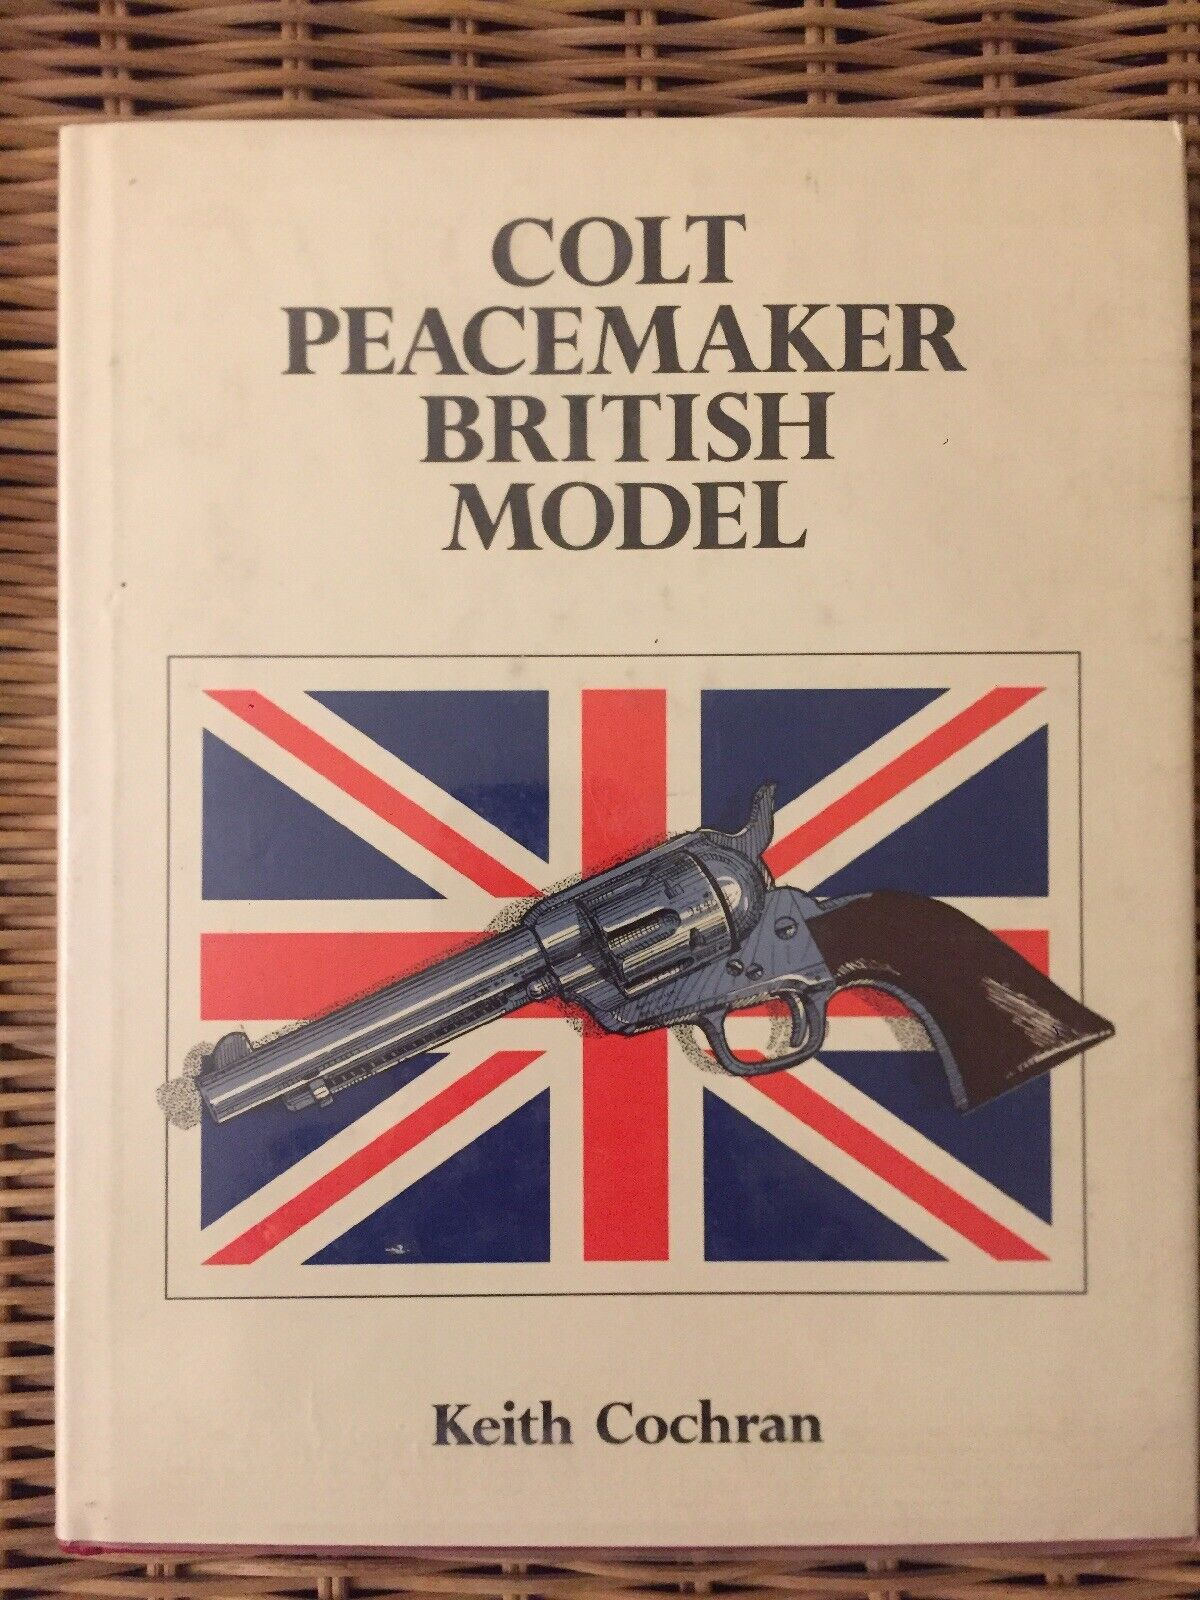 Colt Peacmaker British Modelo Keith Cochran Firmado por autor By 1st Editon